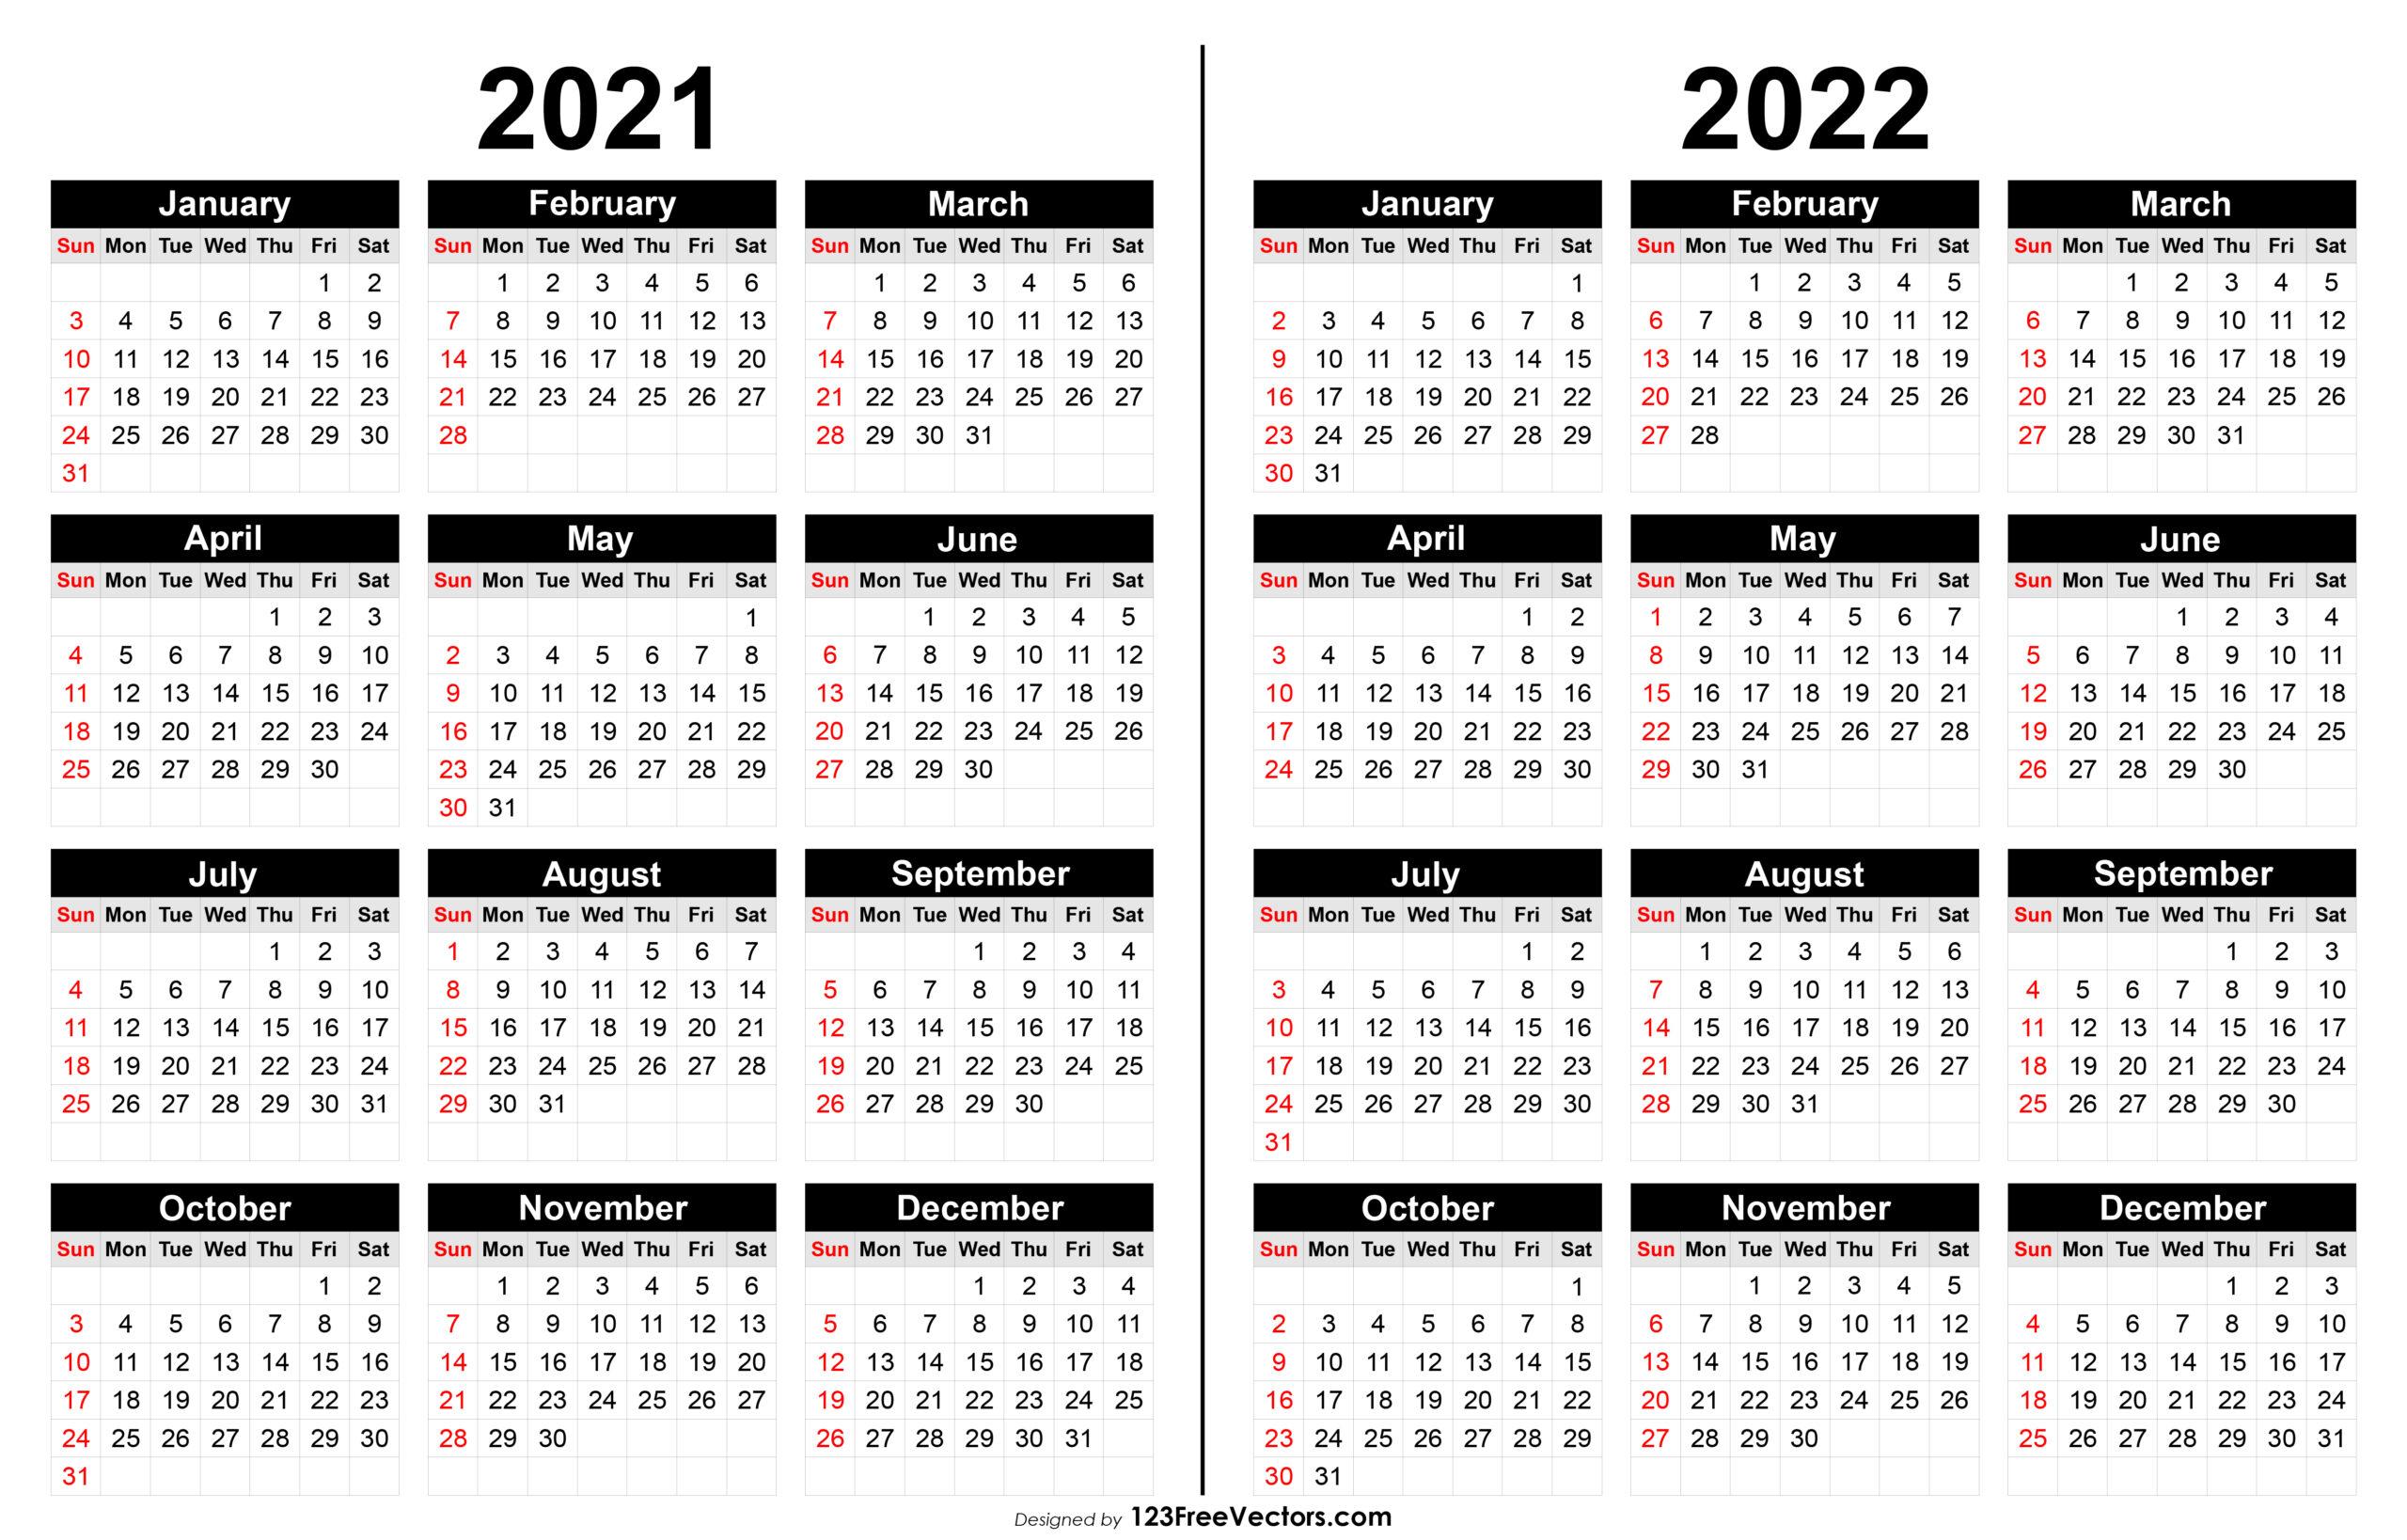 Easter 2022 Calendar - Nexta with Hawaii School Calendar 2022 2023